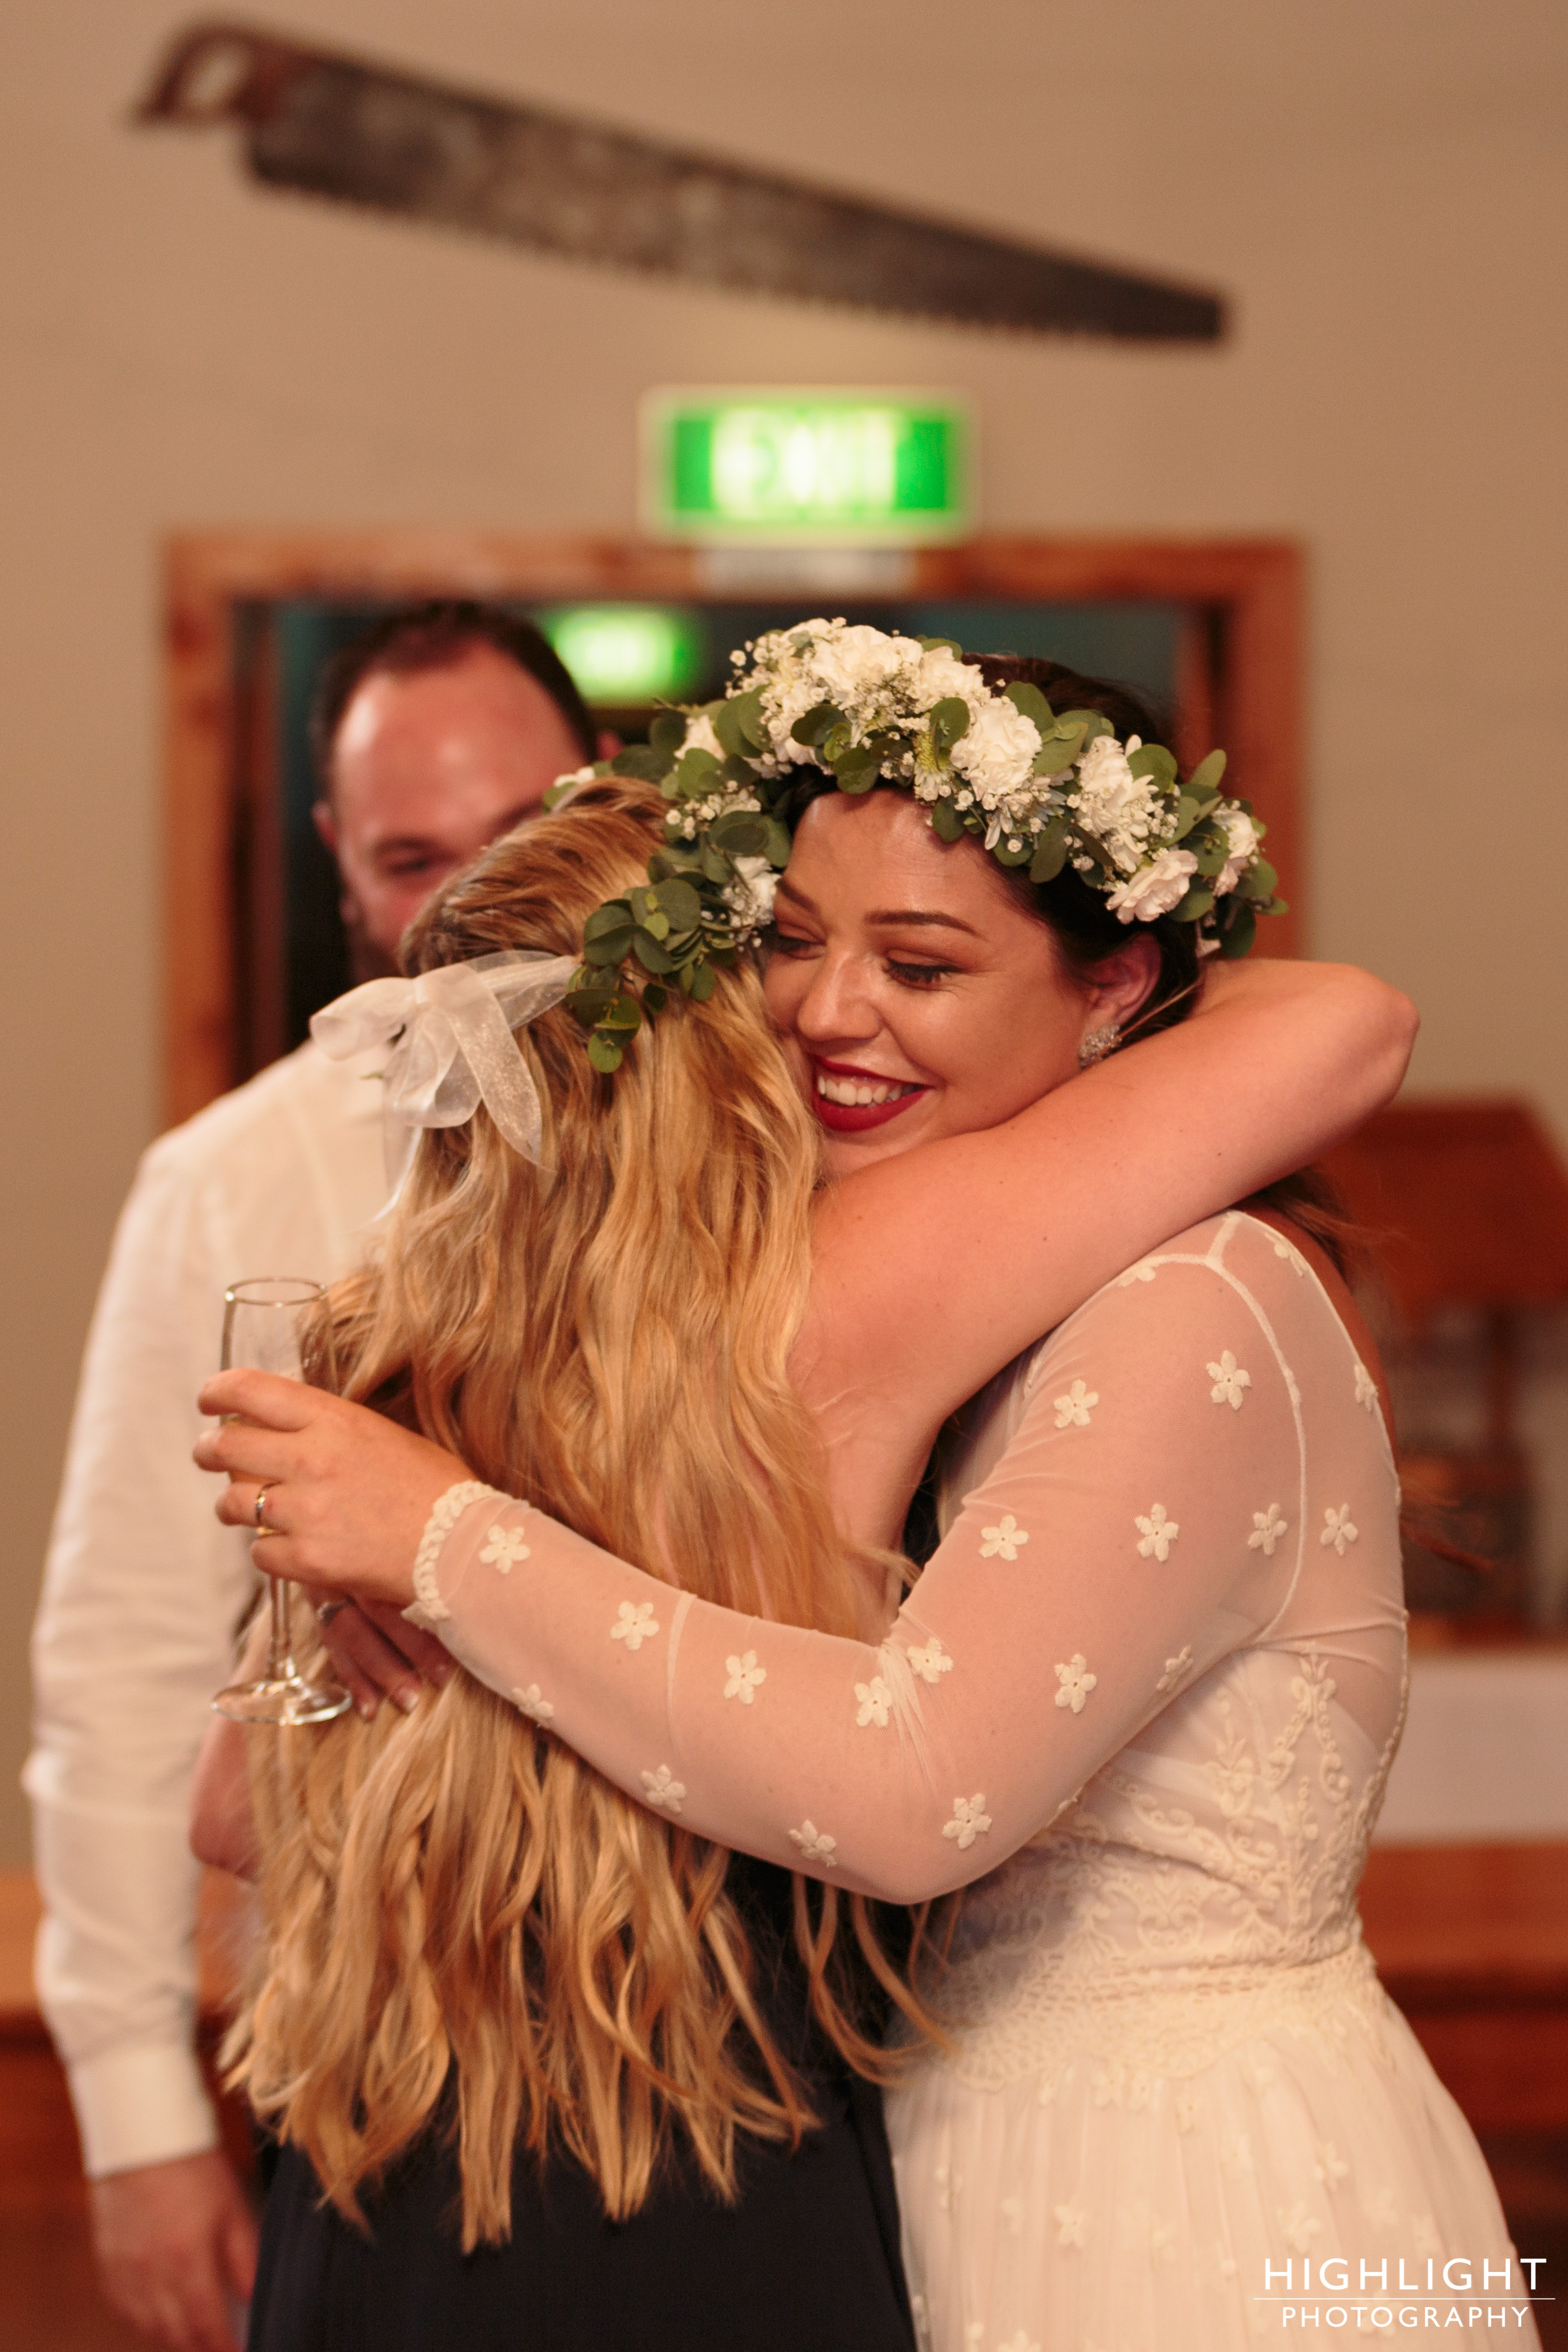 highlight-wedding-photography-new-zealand-makoura-lodge-wedding-171.jpg